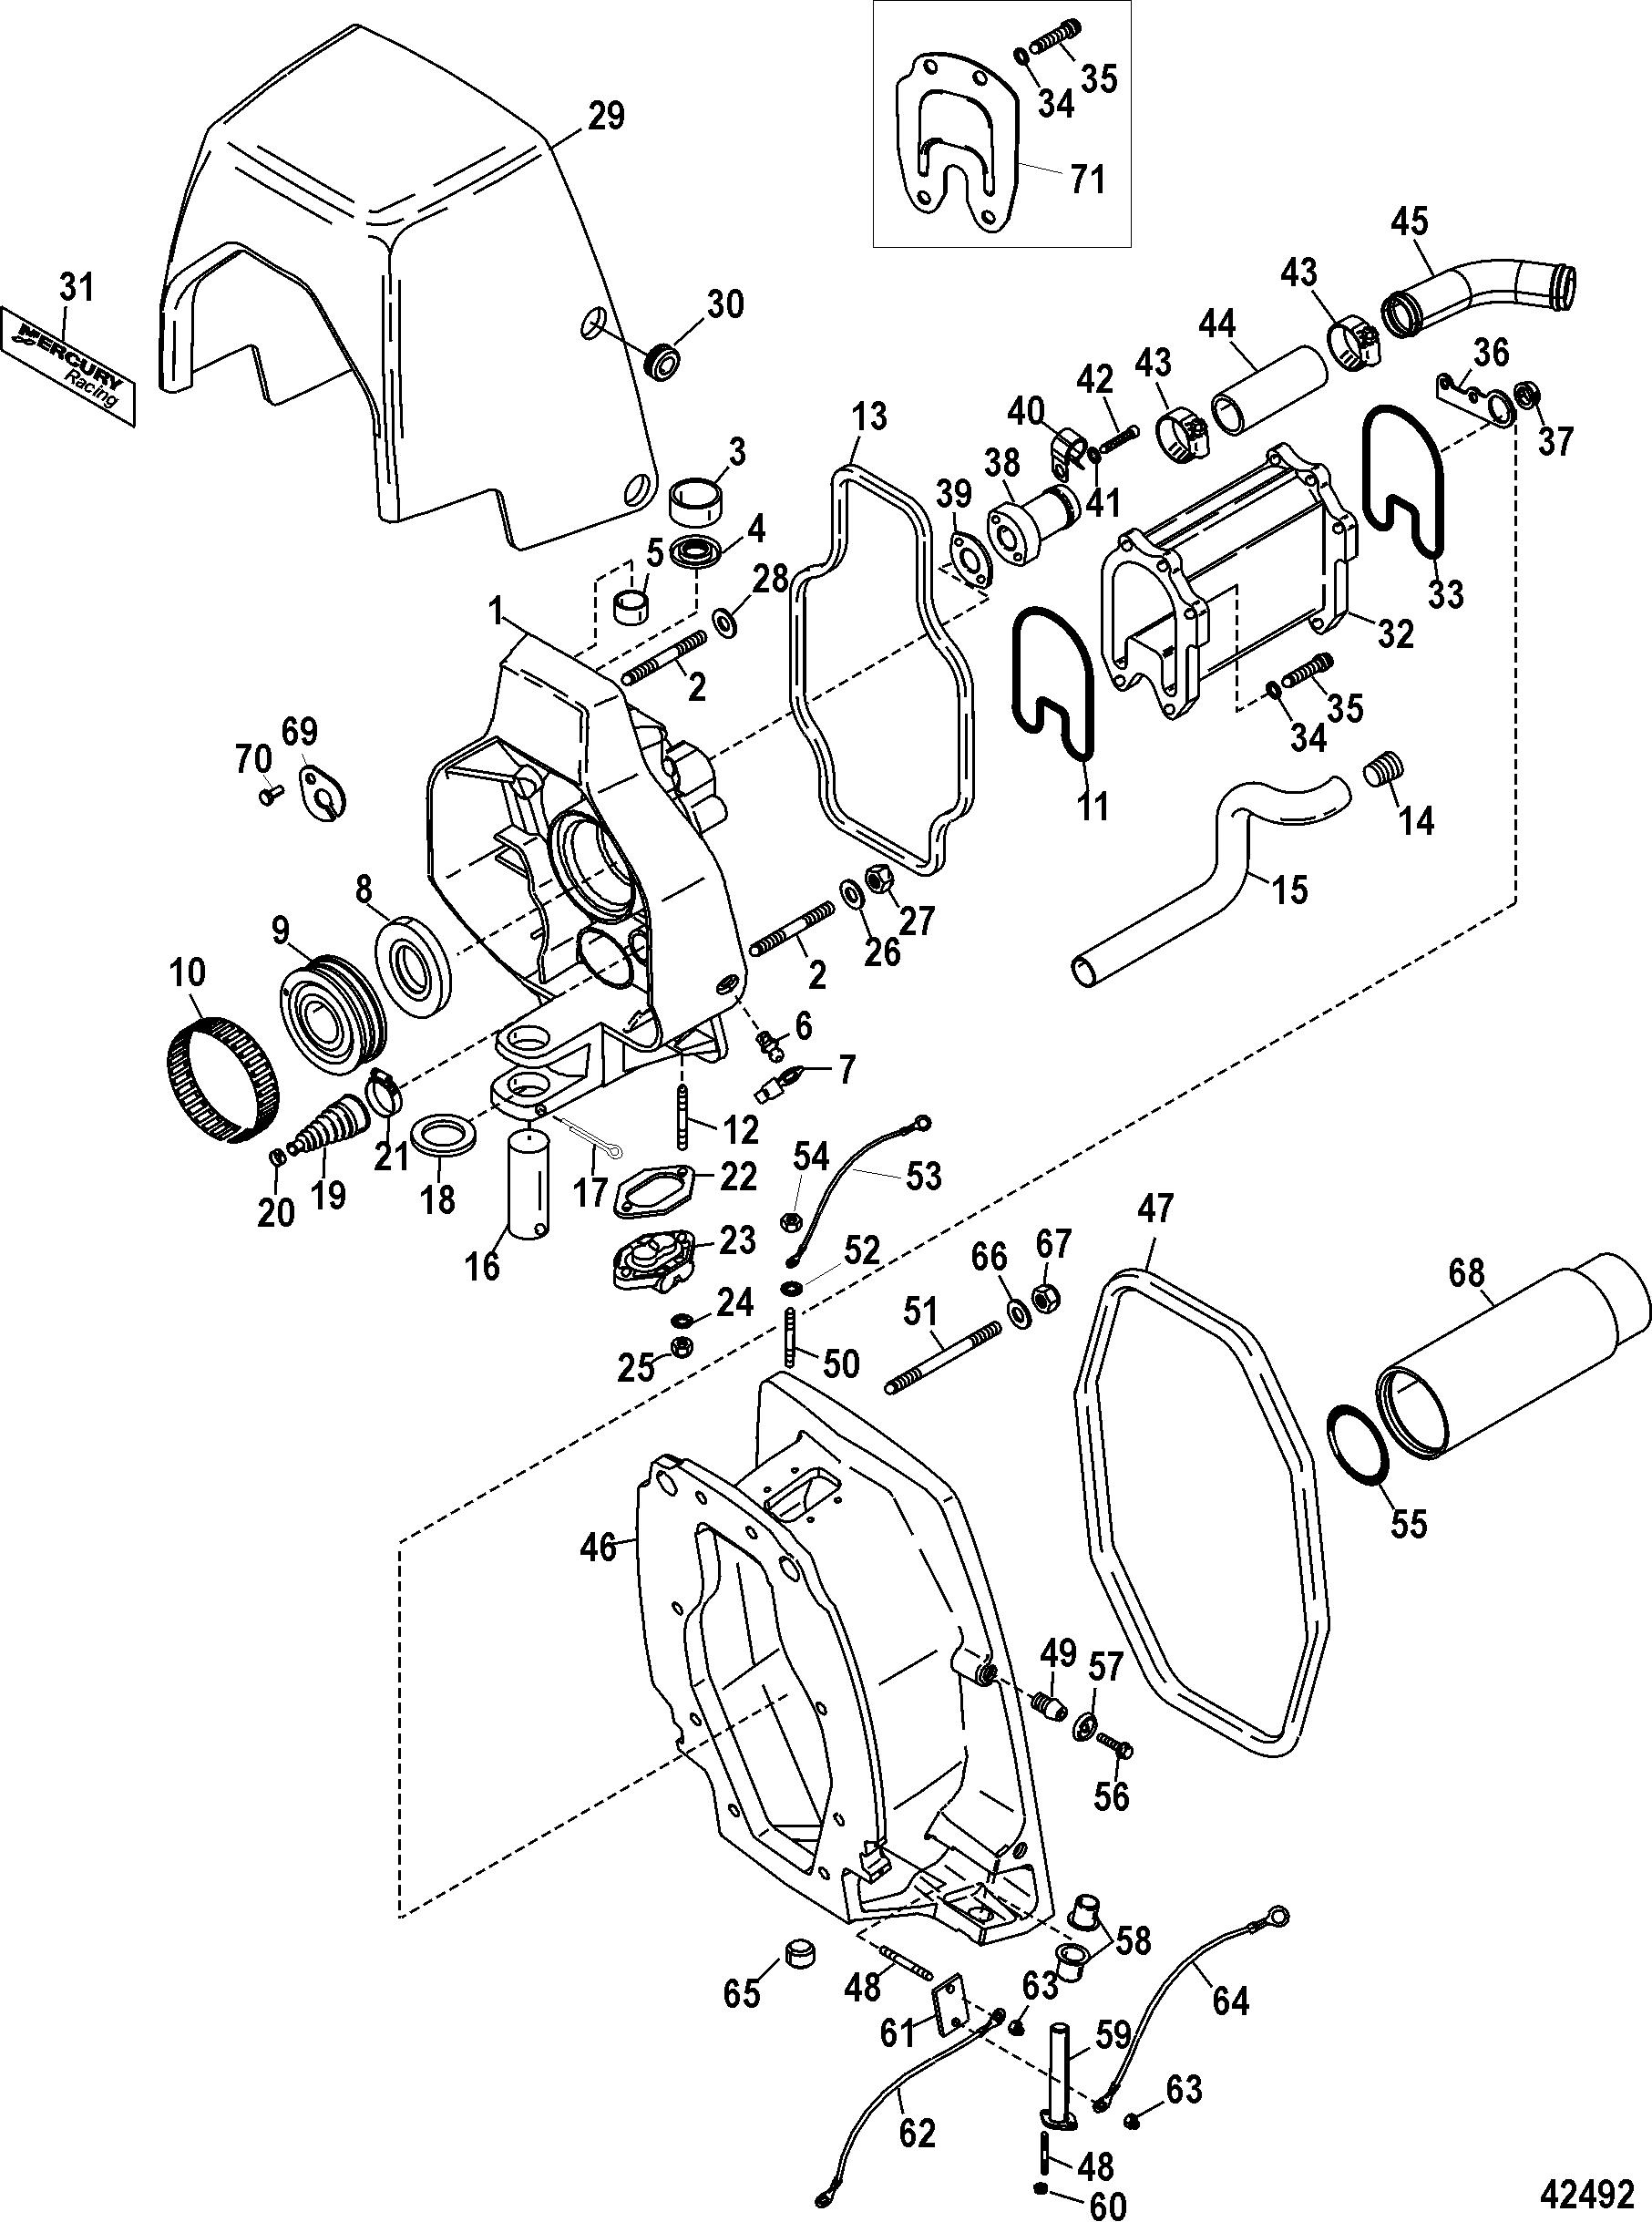 hardin marine gimbal housing  integrated transom mercruiser trim pump diagram mercruiser trim pump diagram mercruiser trim pump diagram mercruiser trim pump diagram